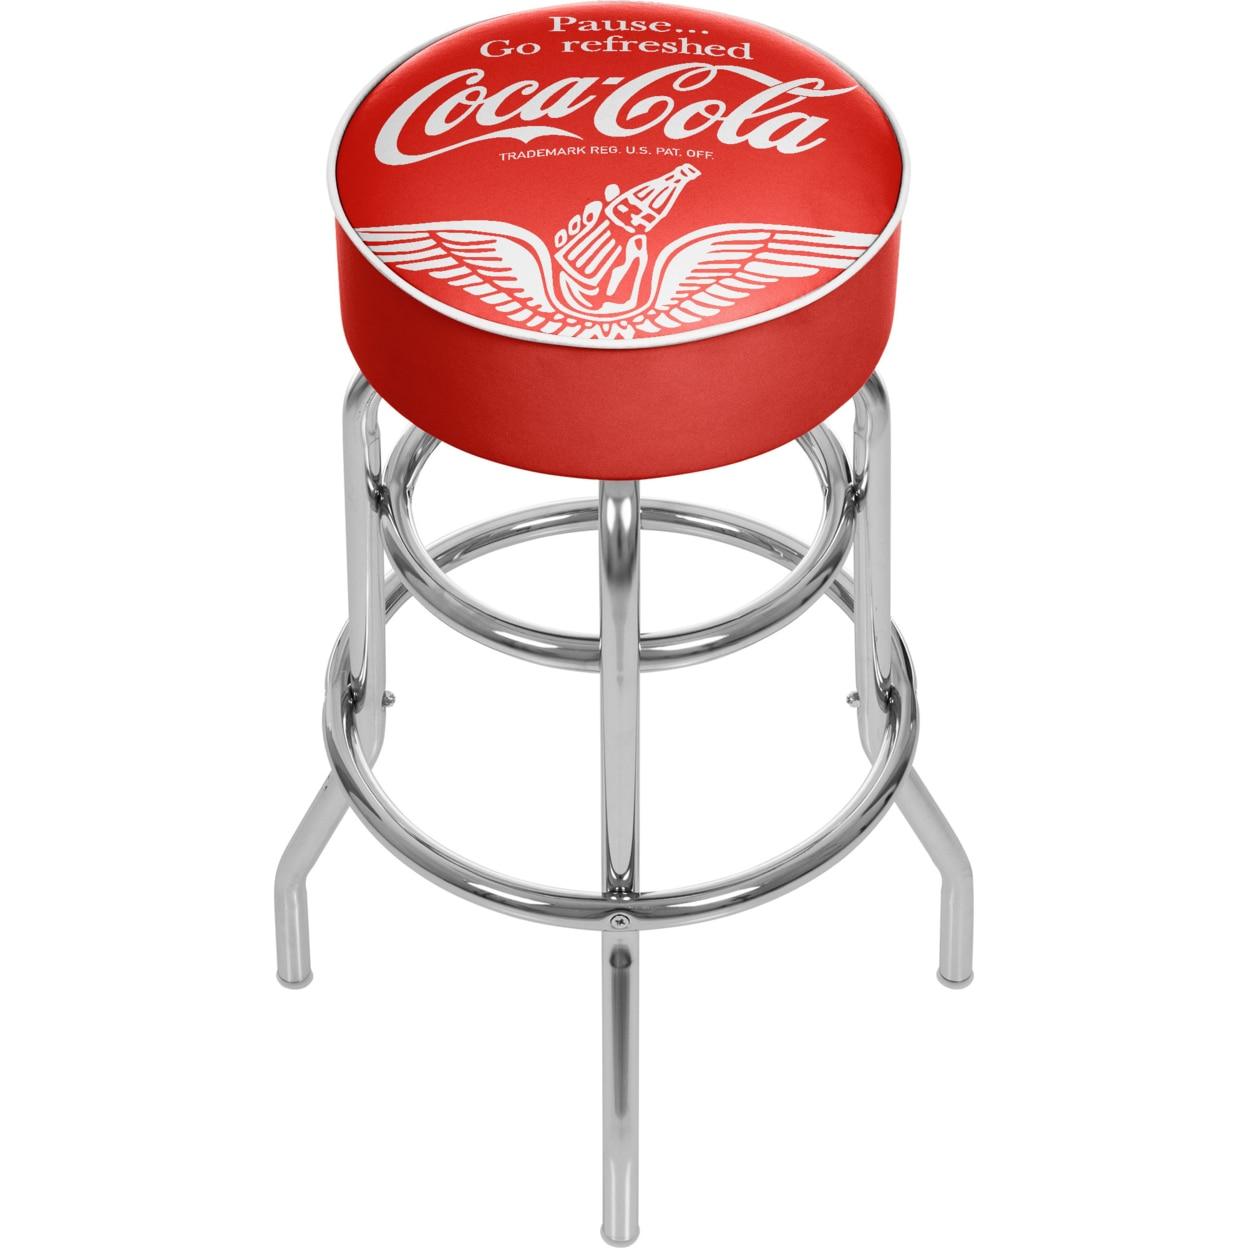 Wings Coca Cola Padded Swivel Bar Stool 30 Inches High coca cola vanilla нижний новгород